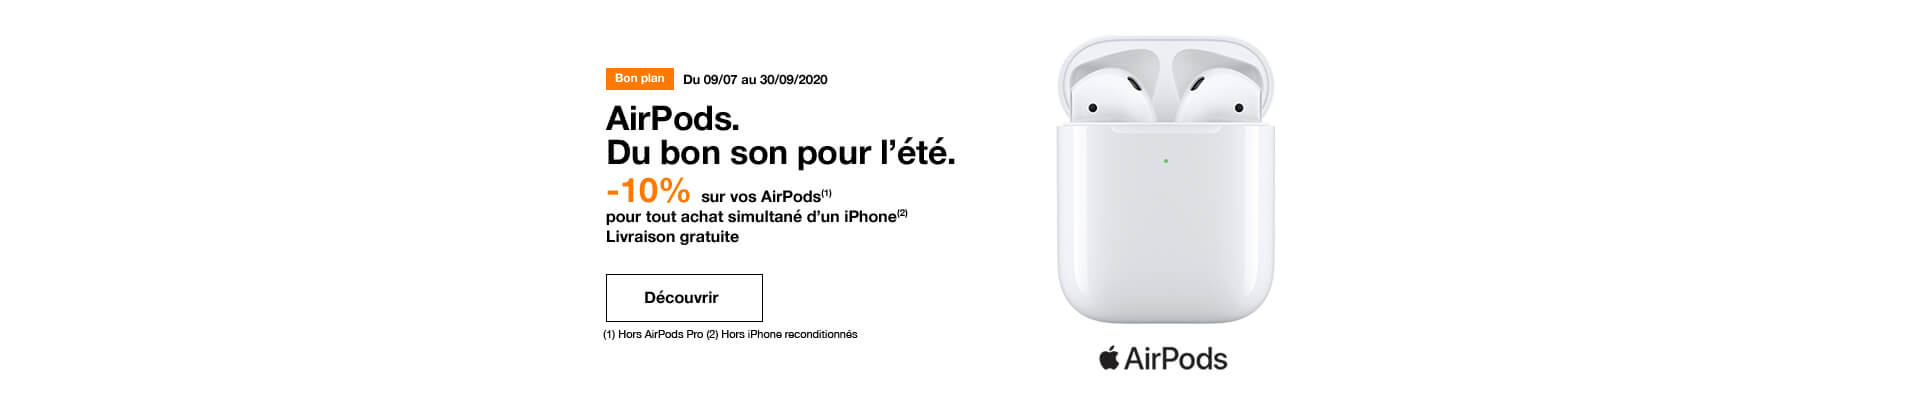 iPhone et Airpods